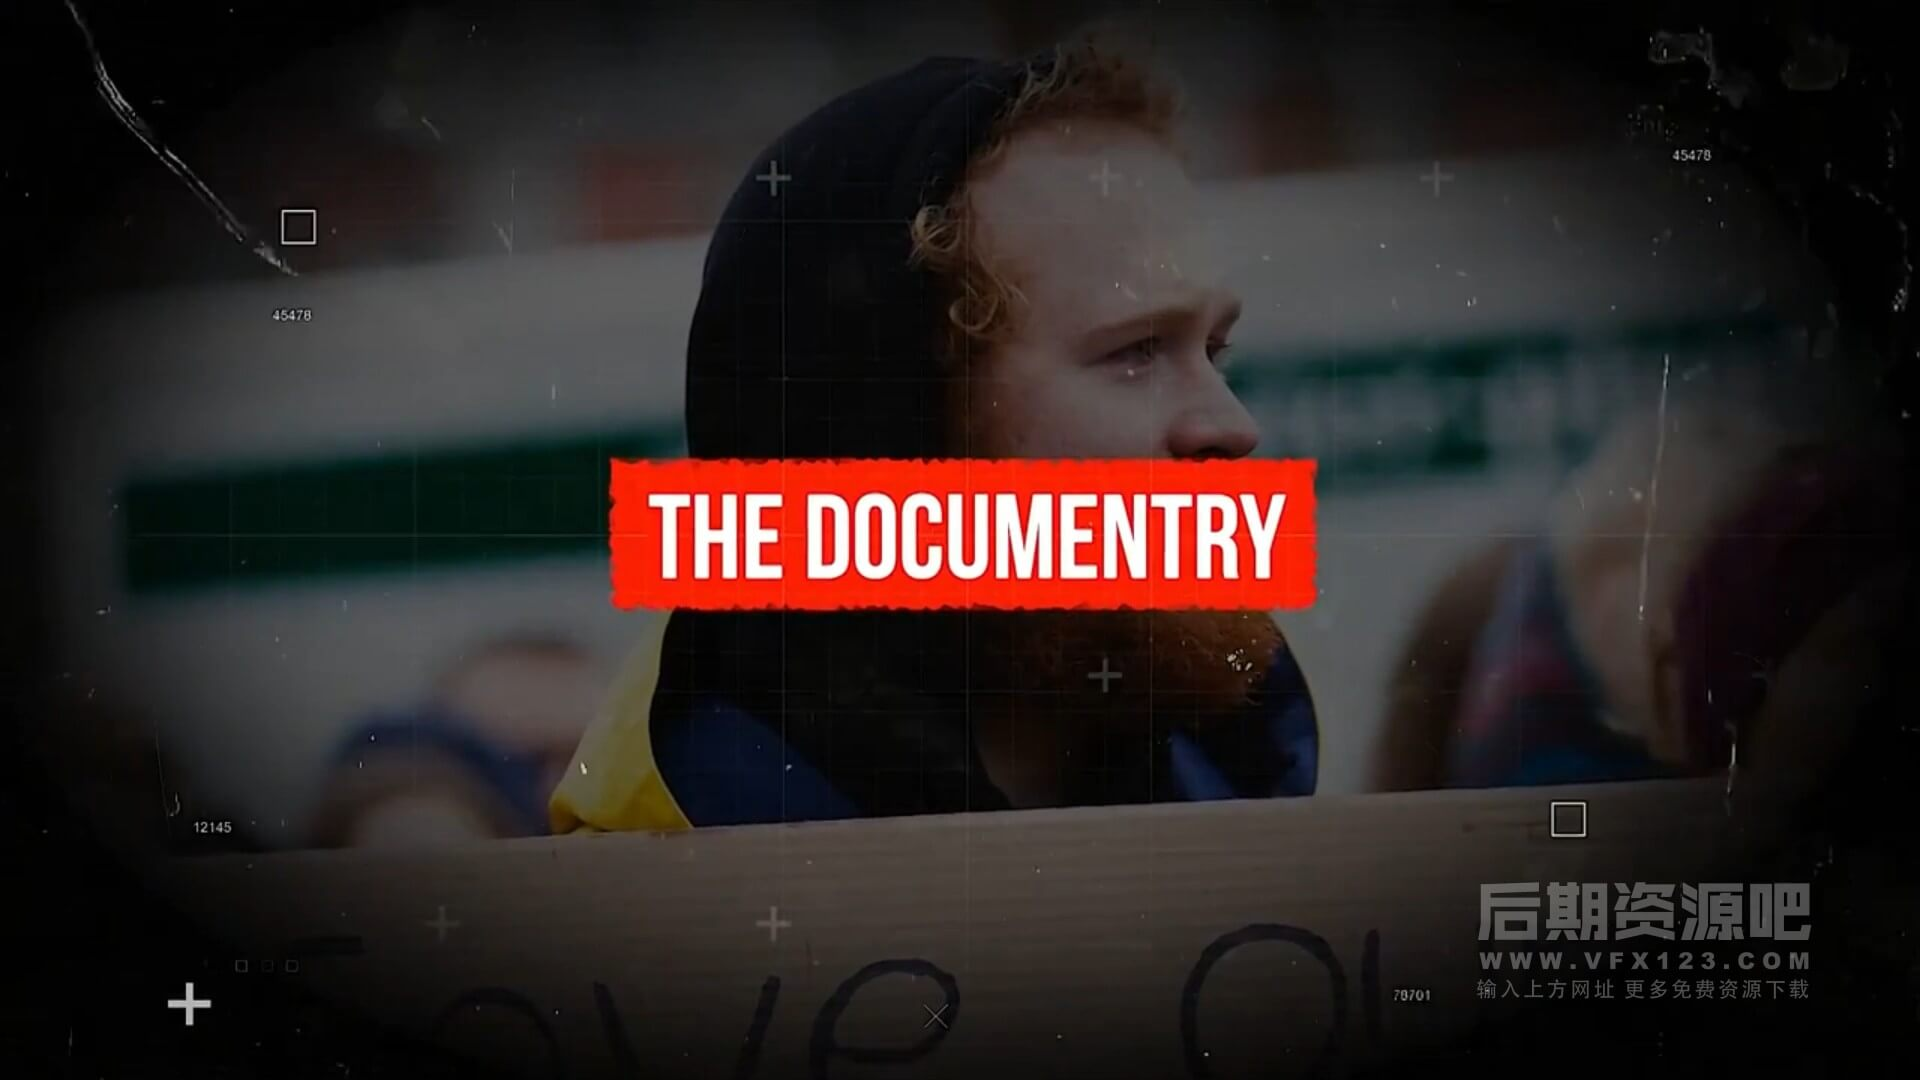 fcpx插件 历史回顾复古胶片风格相册展示纪录片片头模板 The Documentary